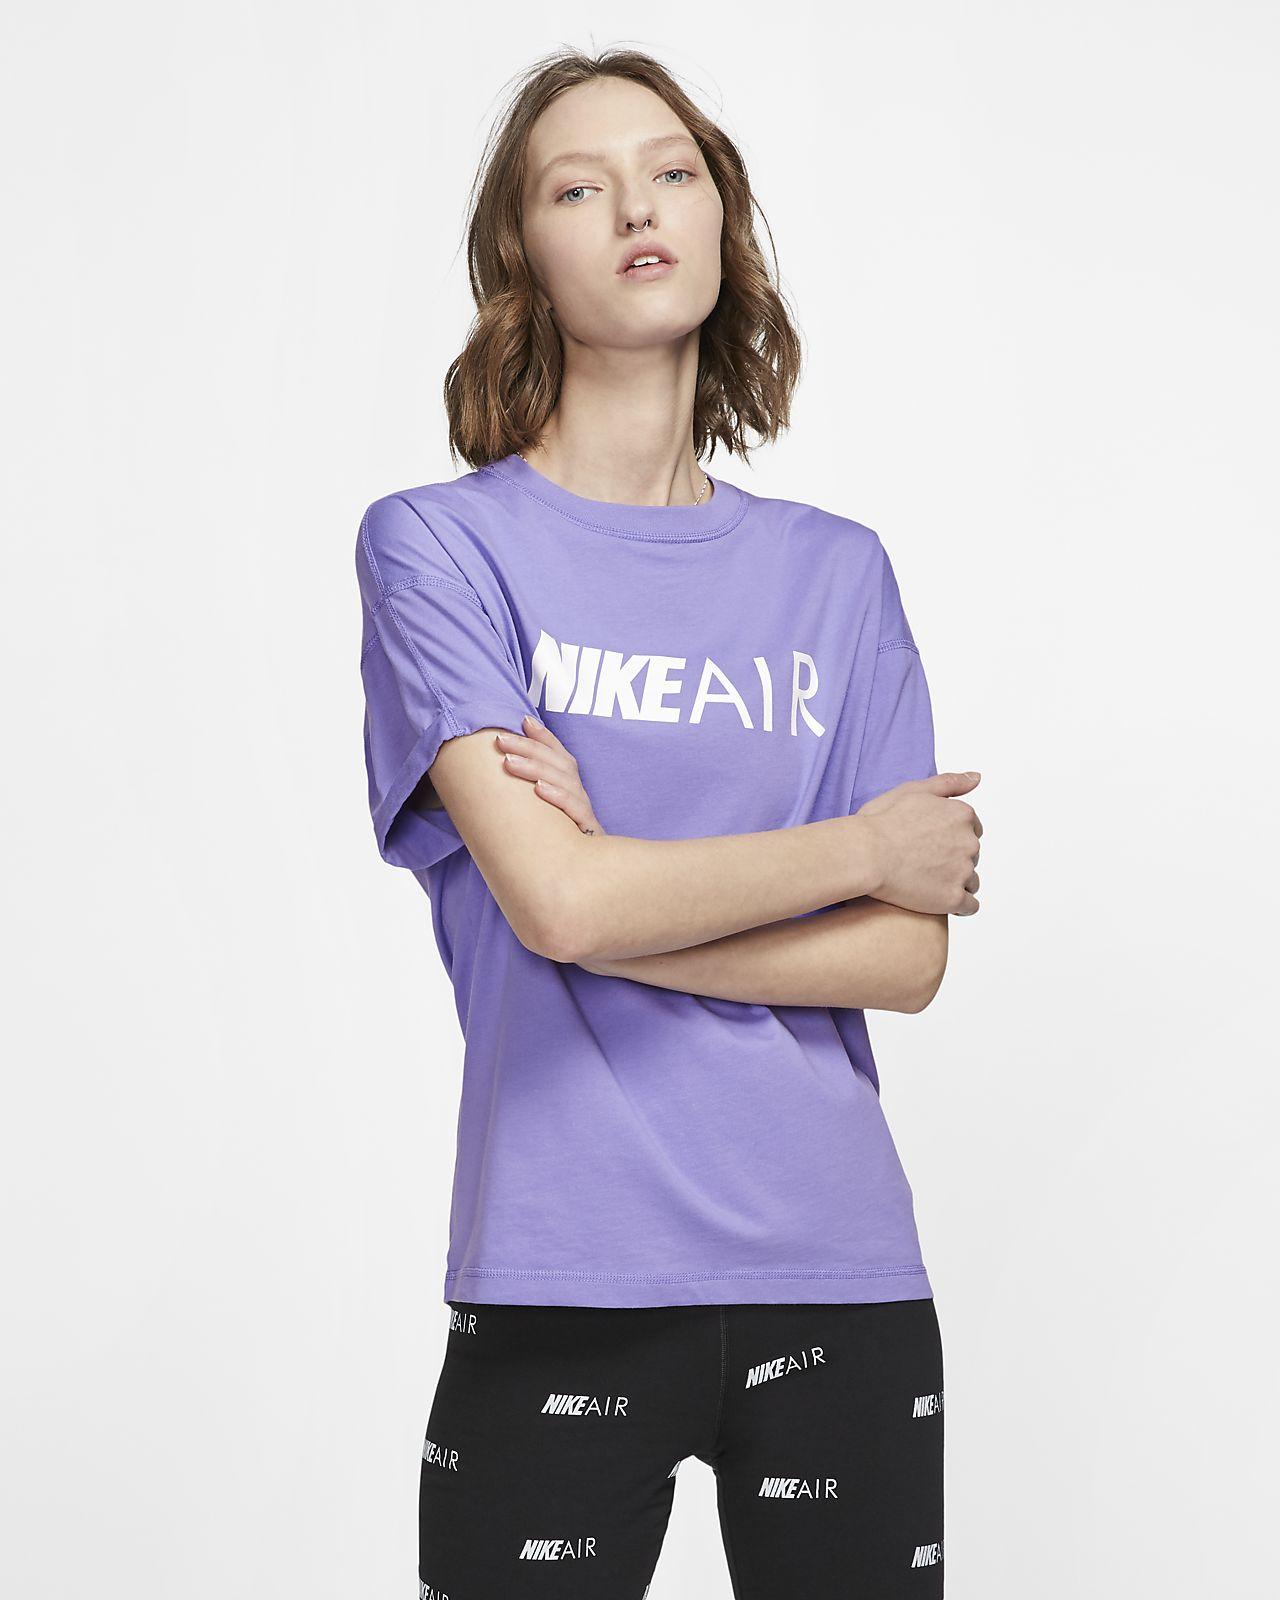 2938f839e55 Low Resolution Nike Air Women s Top Nike Air Women s Top